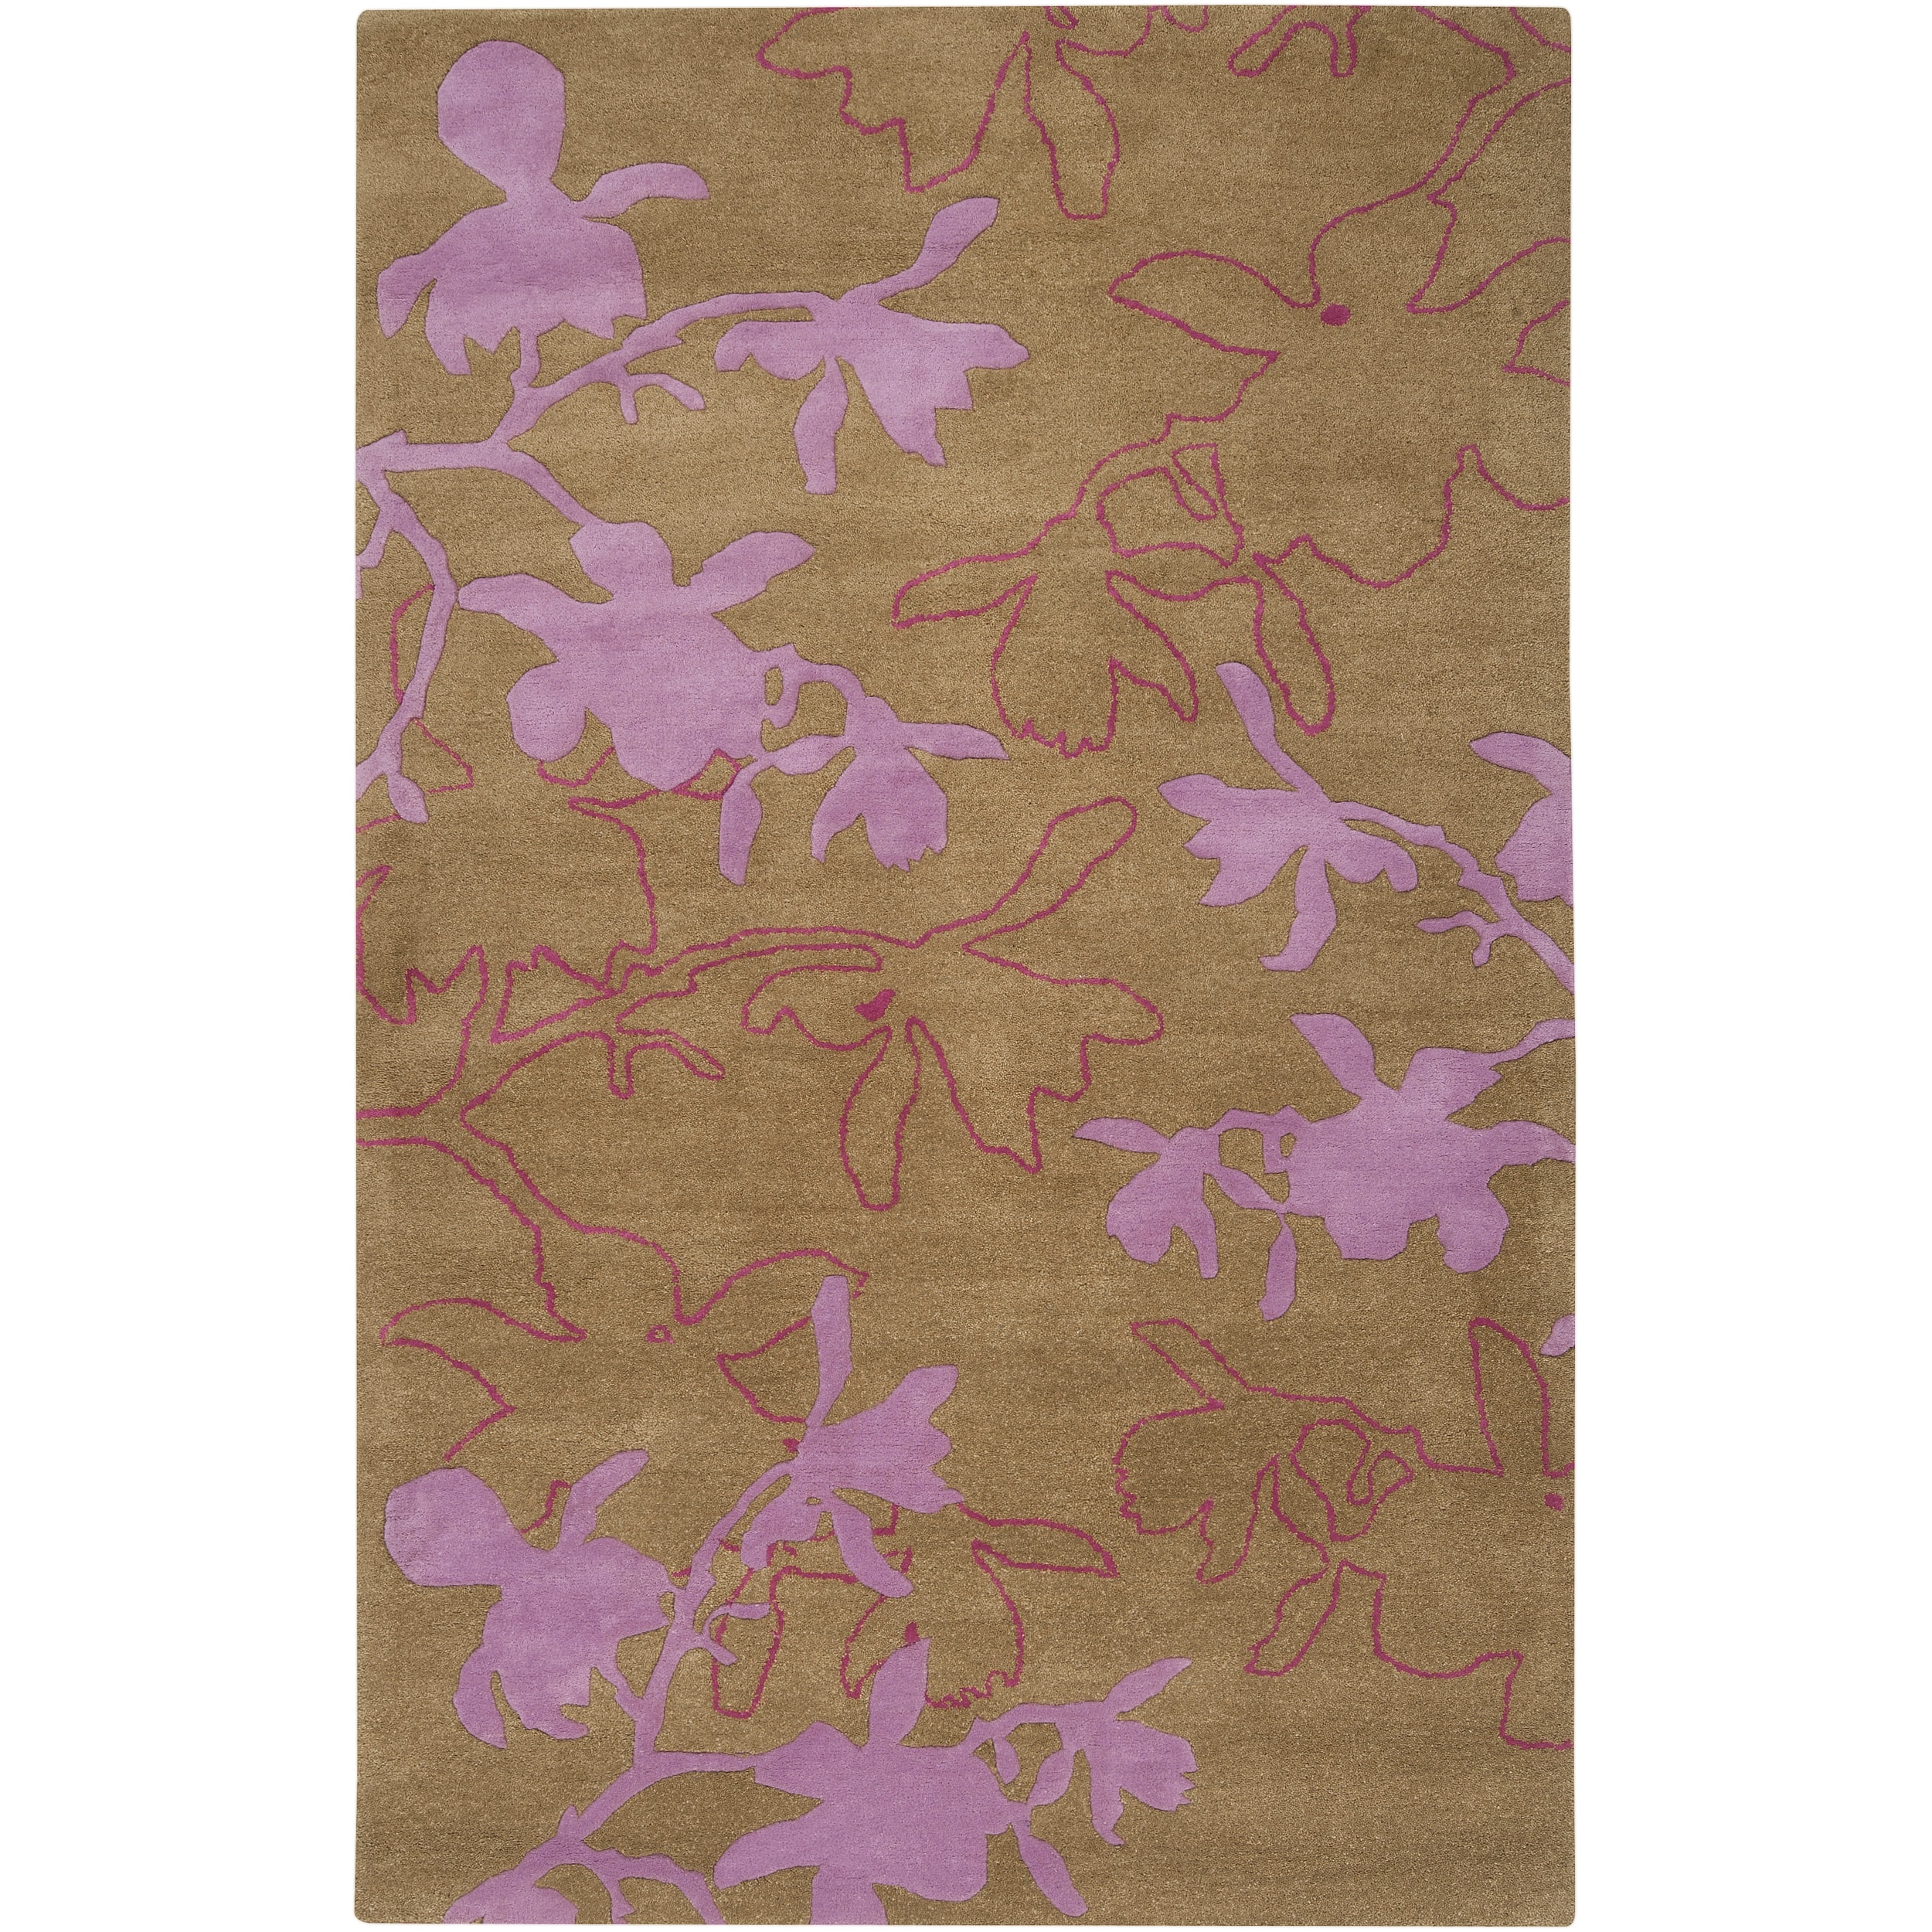 Jef Designs Hand Tufted Tan Purple Contemporary Abiqua